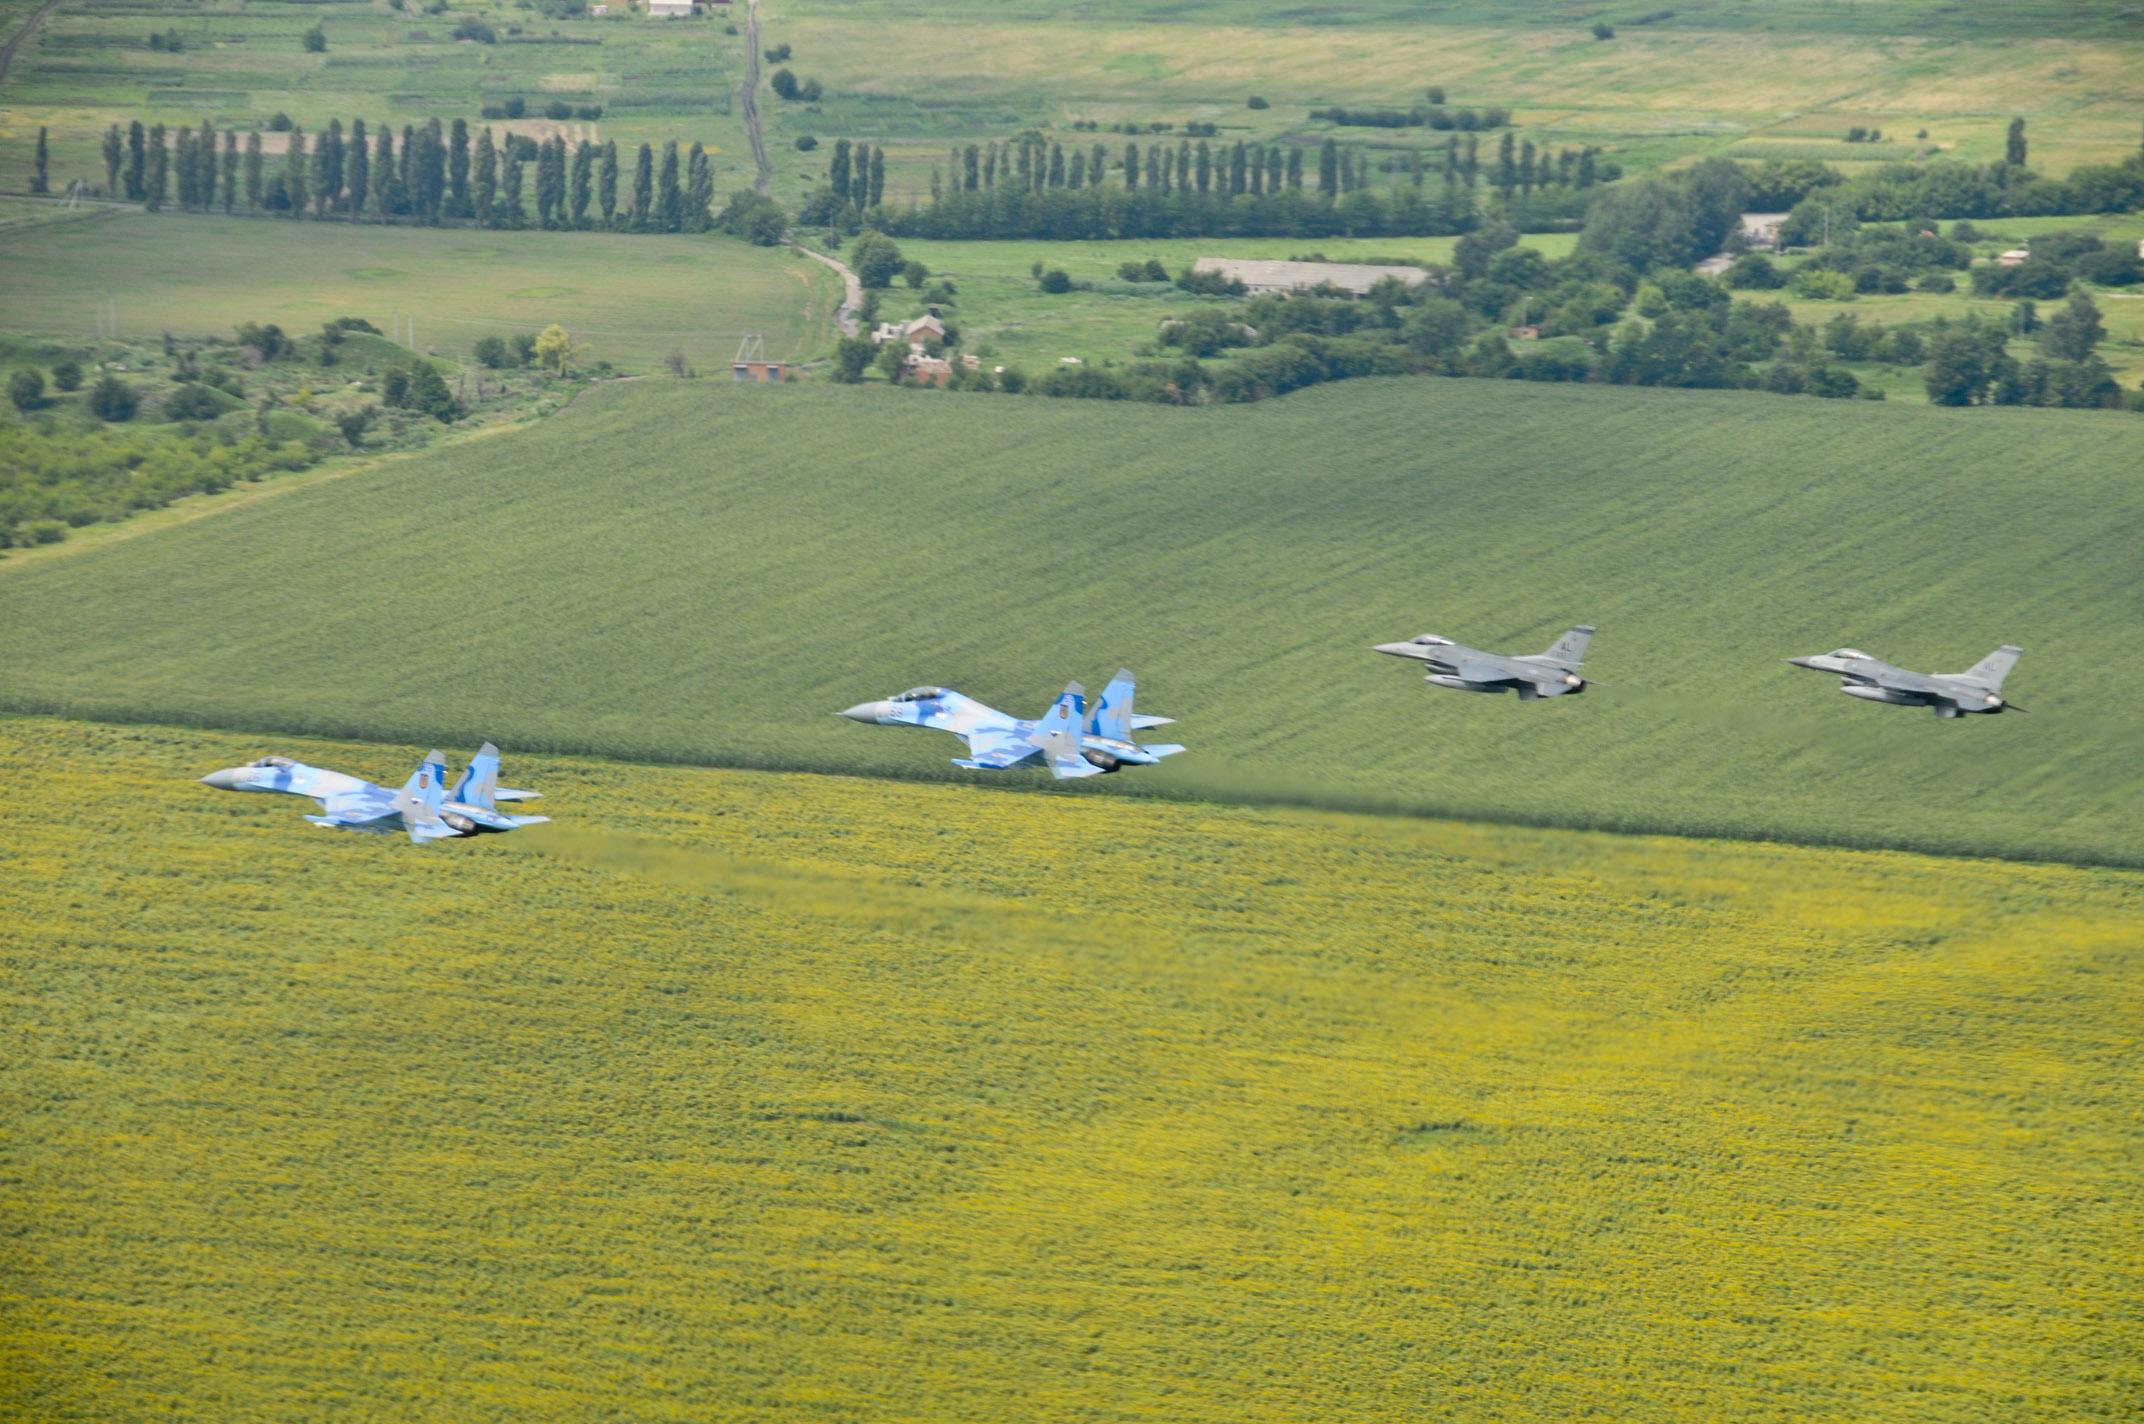 Ukraine SU-27s fly with Alabama Air National Guard F-16